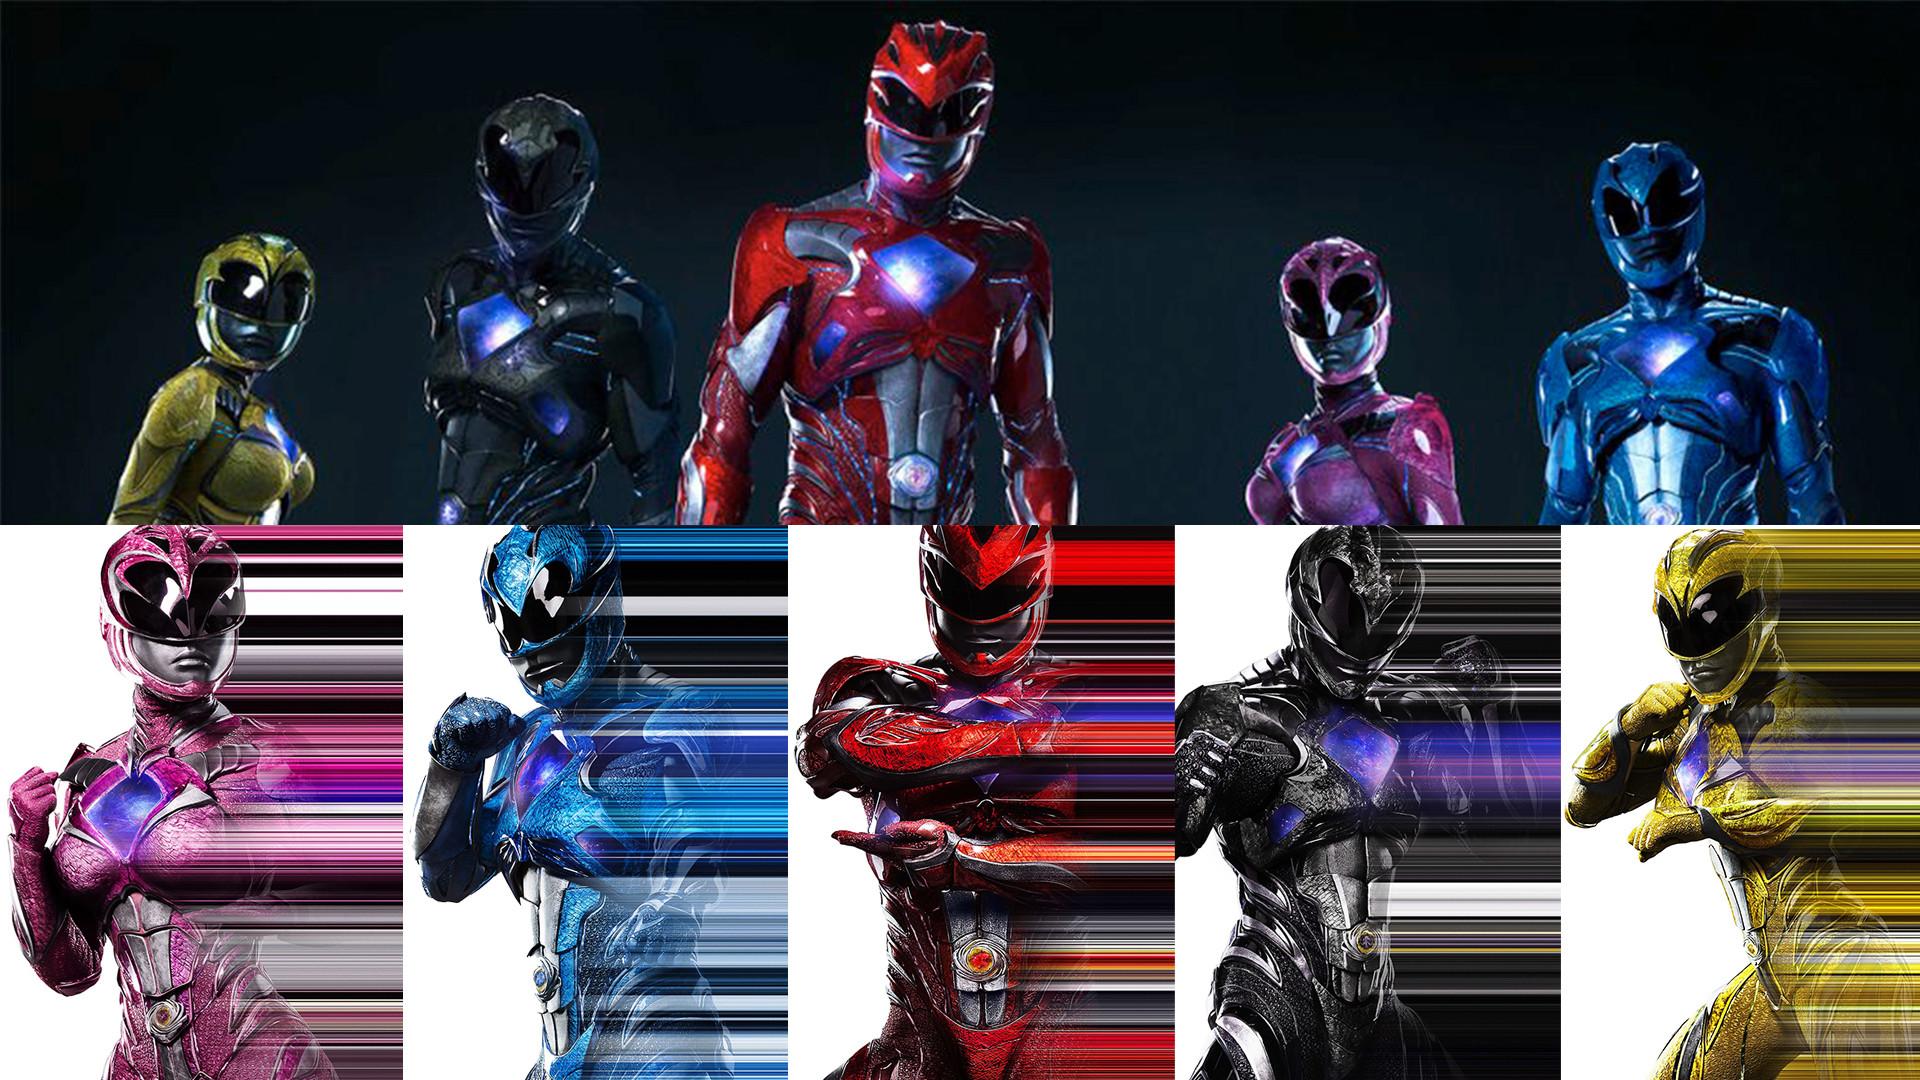 Power Rangers filme 2017 HD papel de parede # 2536- wallpaperhitz.com